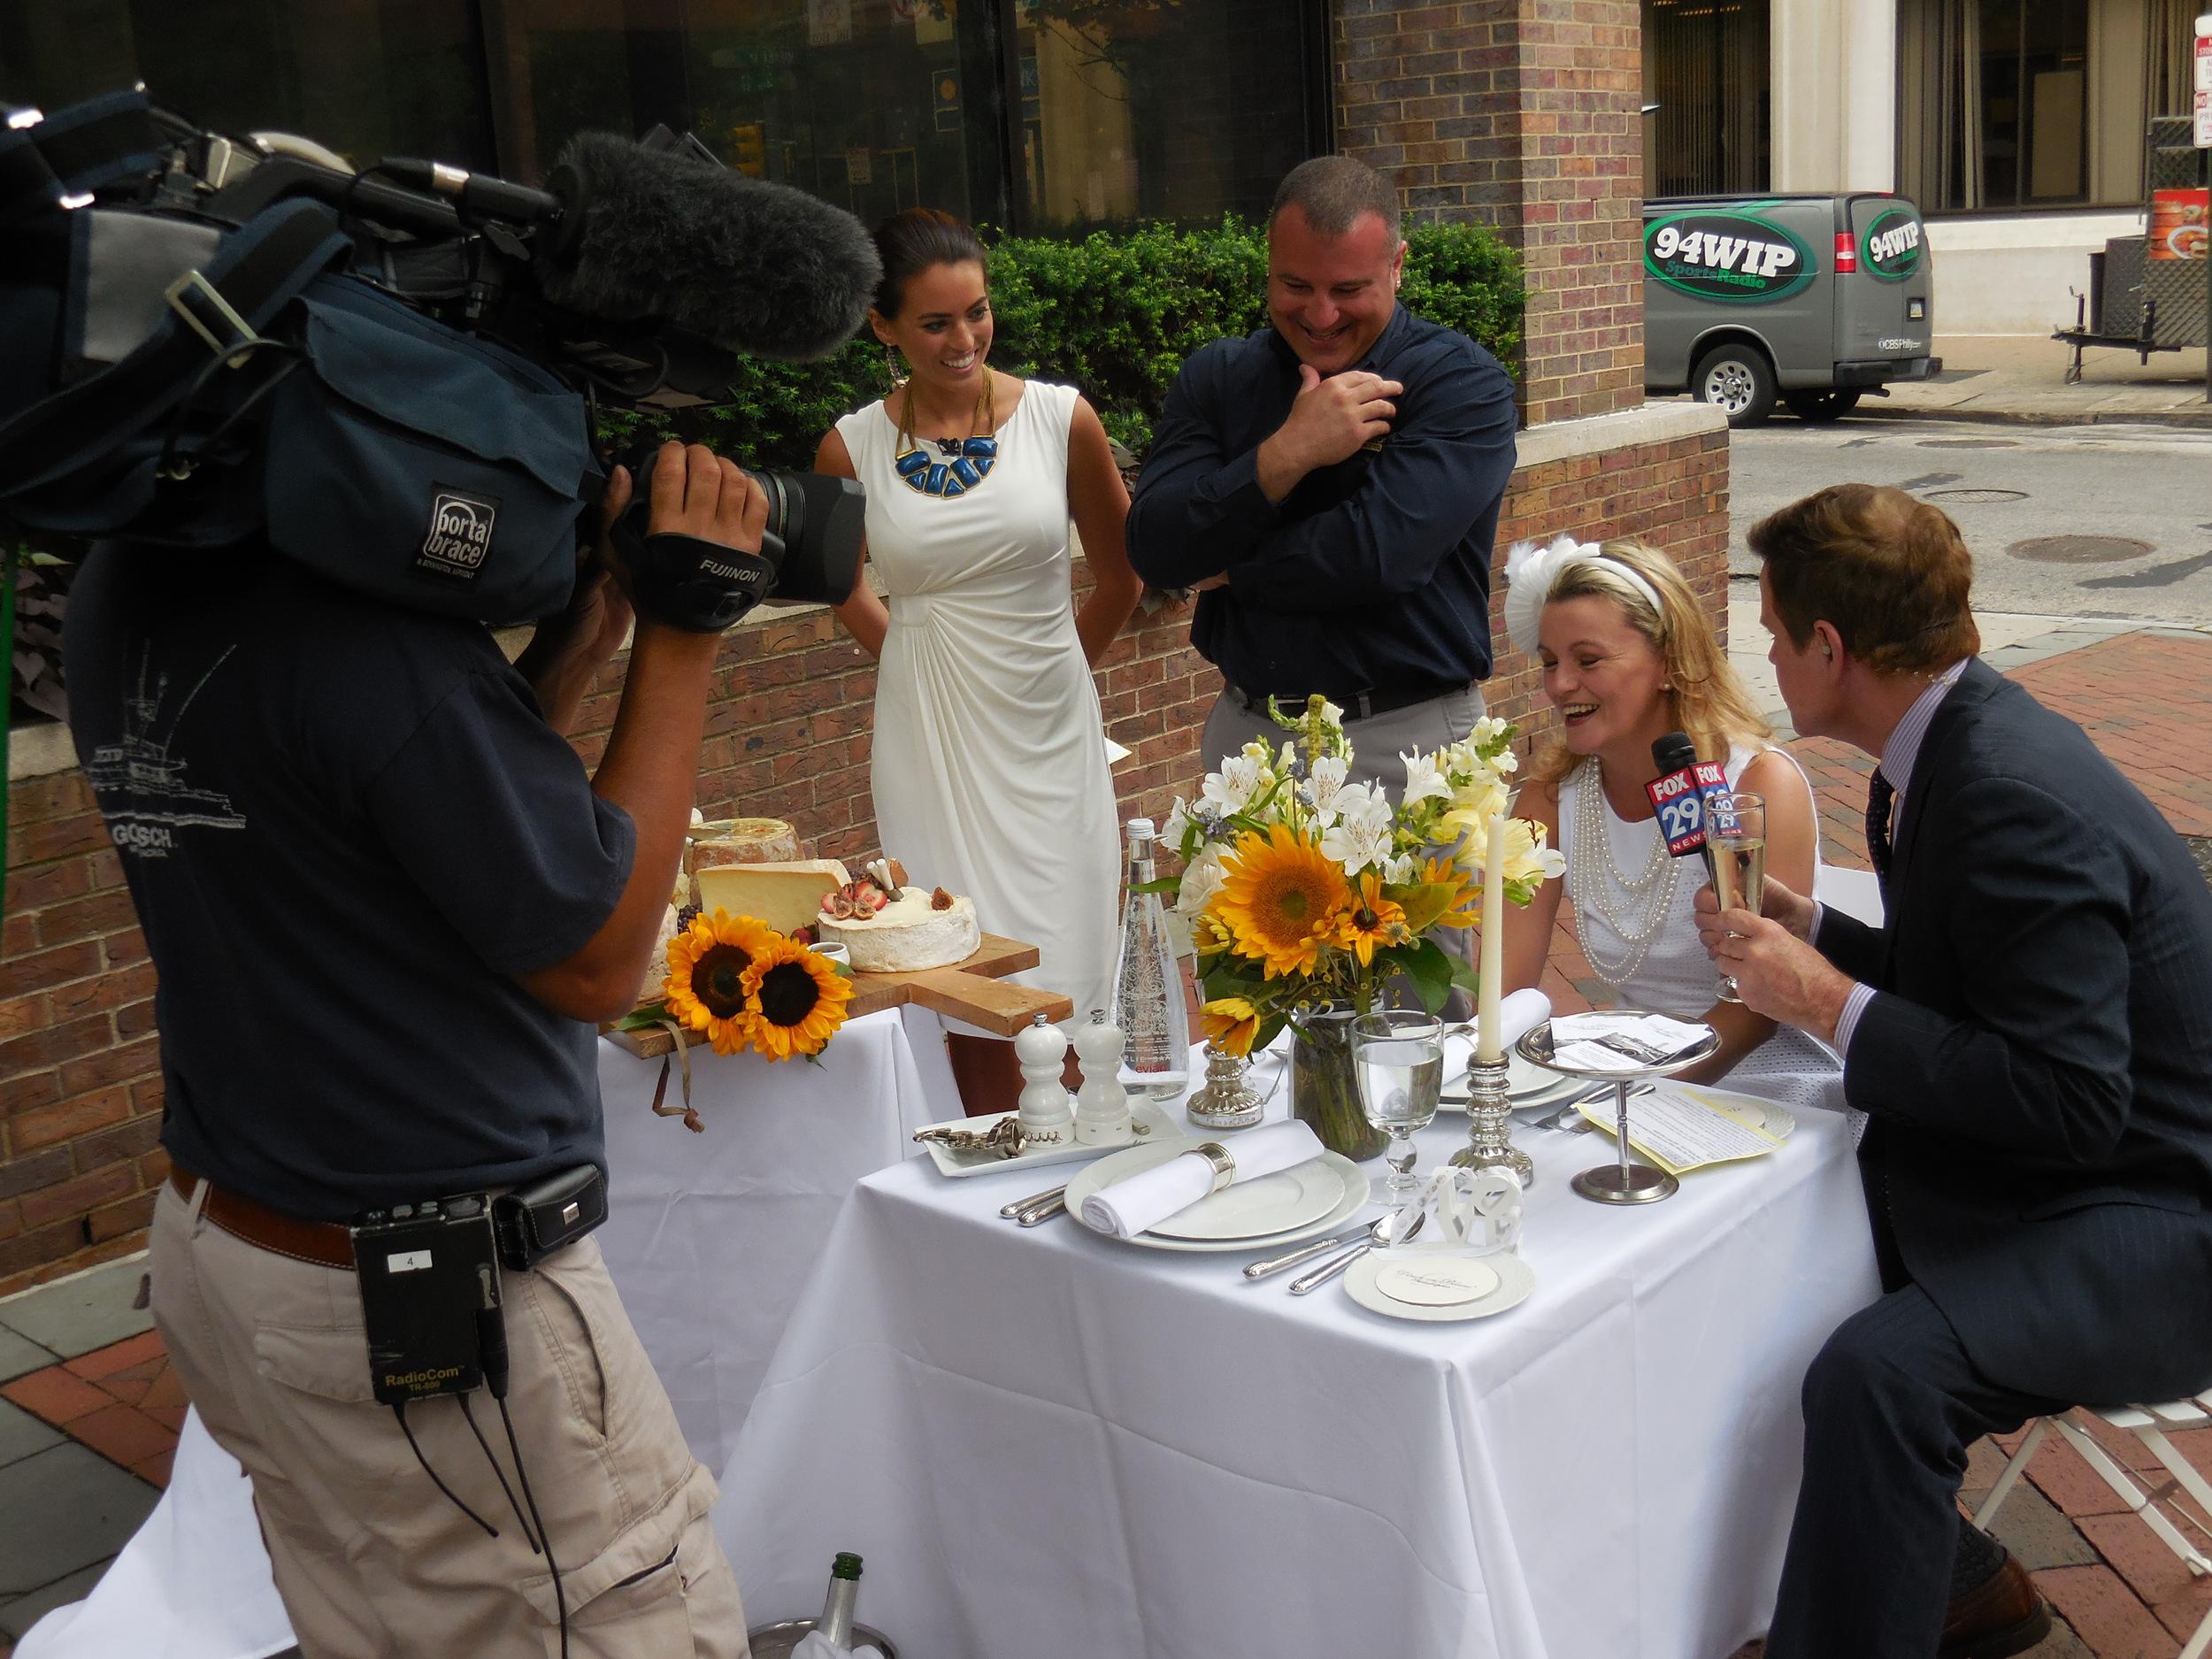 Diner en Blanc, Philadelphia, PR, TV Shoot, Fox 29, Good Day Philadelphia, Mike Jerrick, DiBruno Bros